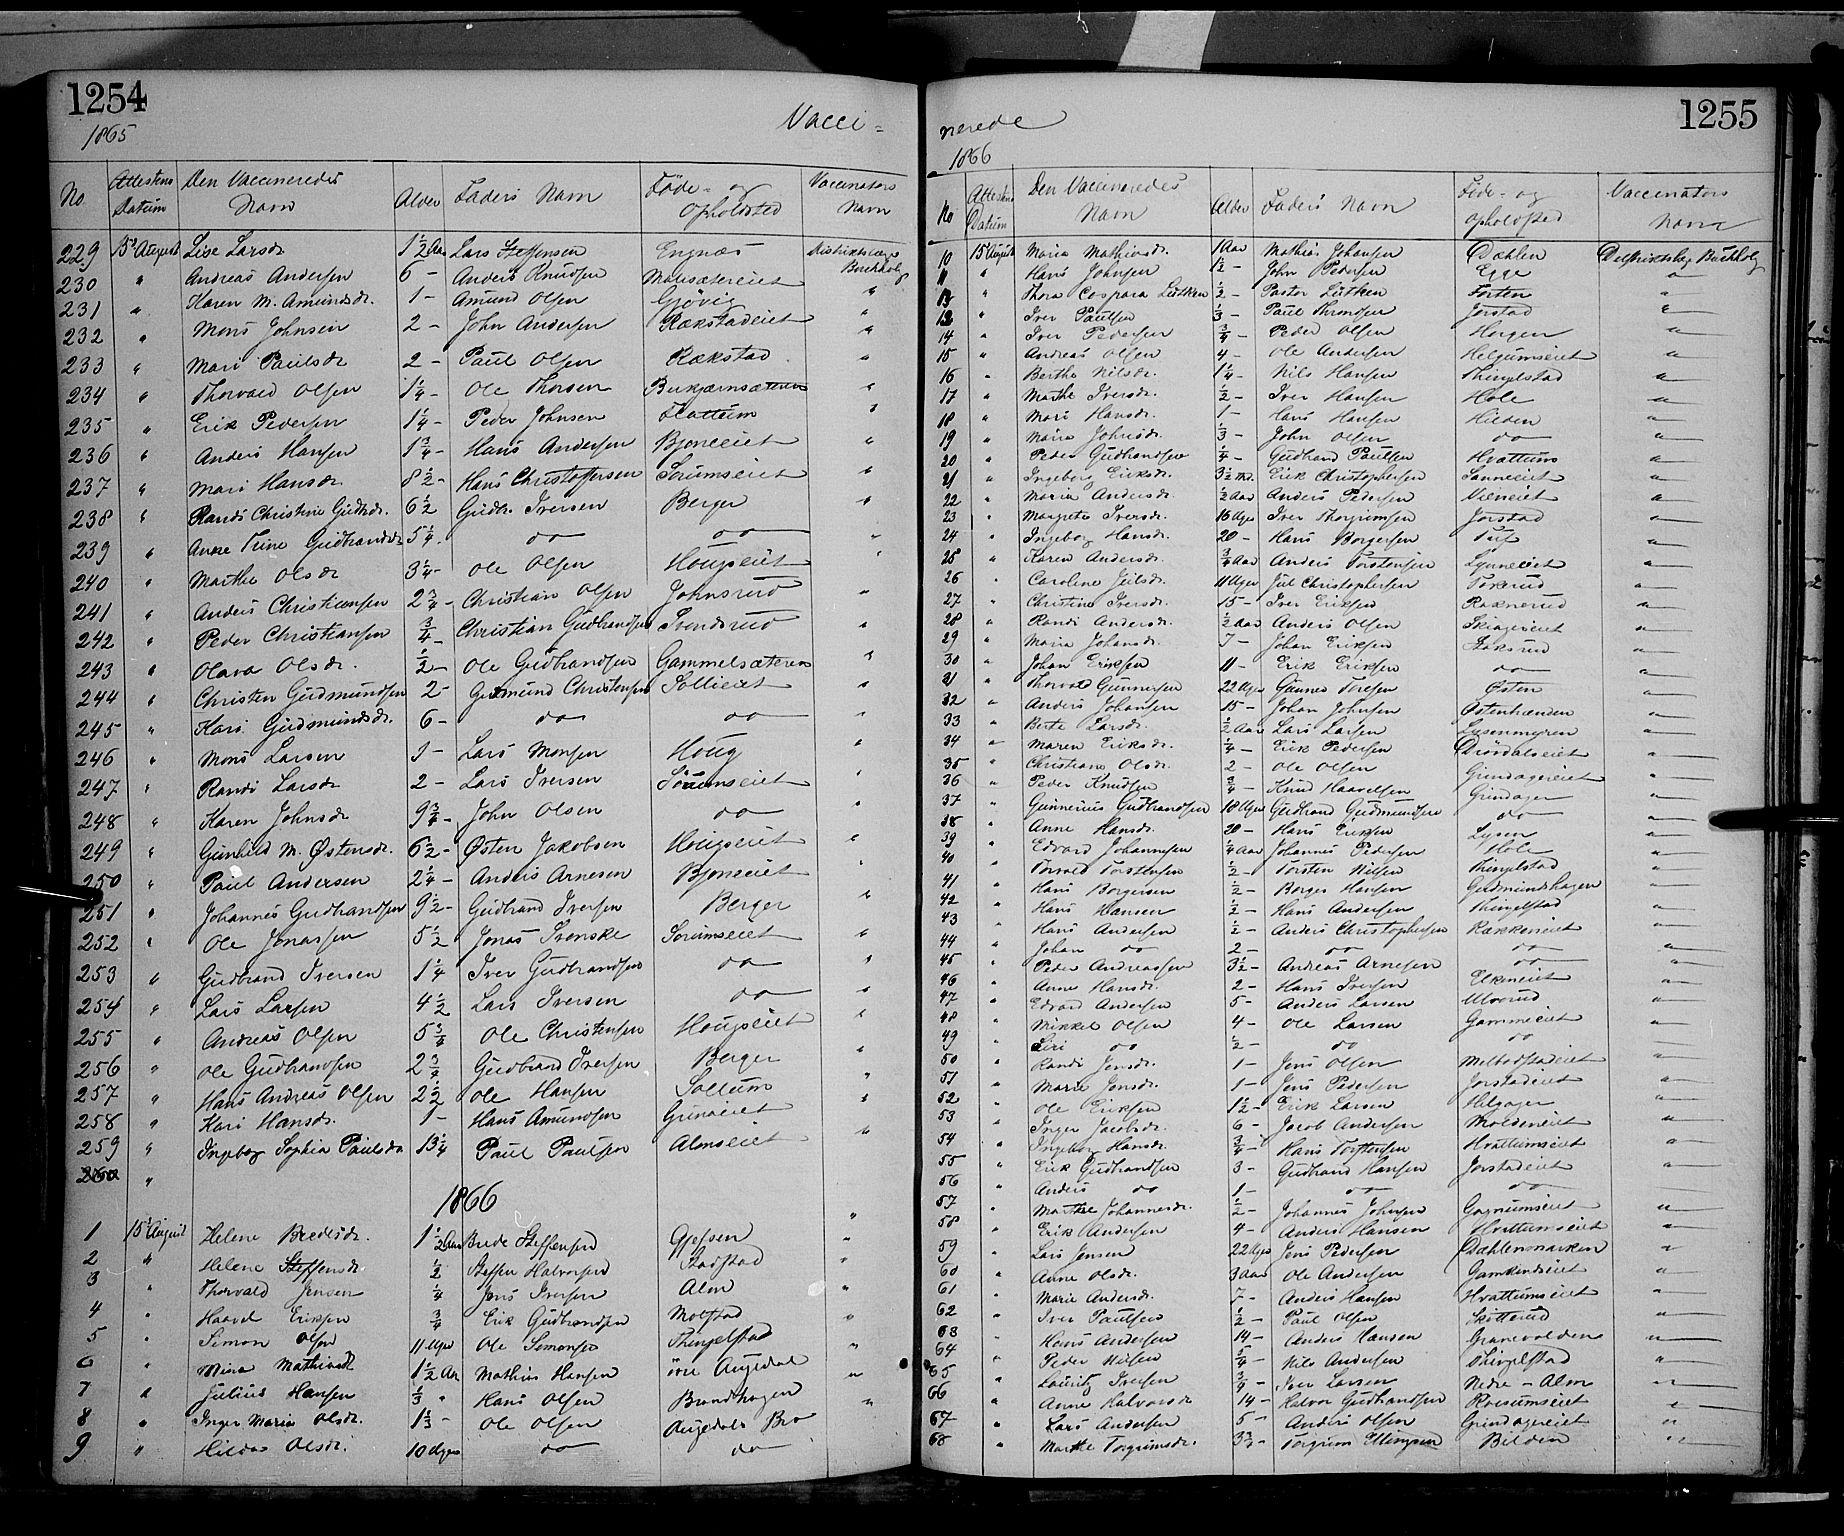 SAH, Gran prestekontor, Ministerialbok nr. 12, 1856-1874, s. 1254-1255